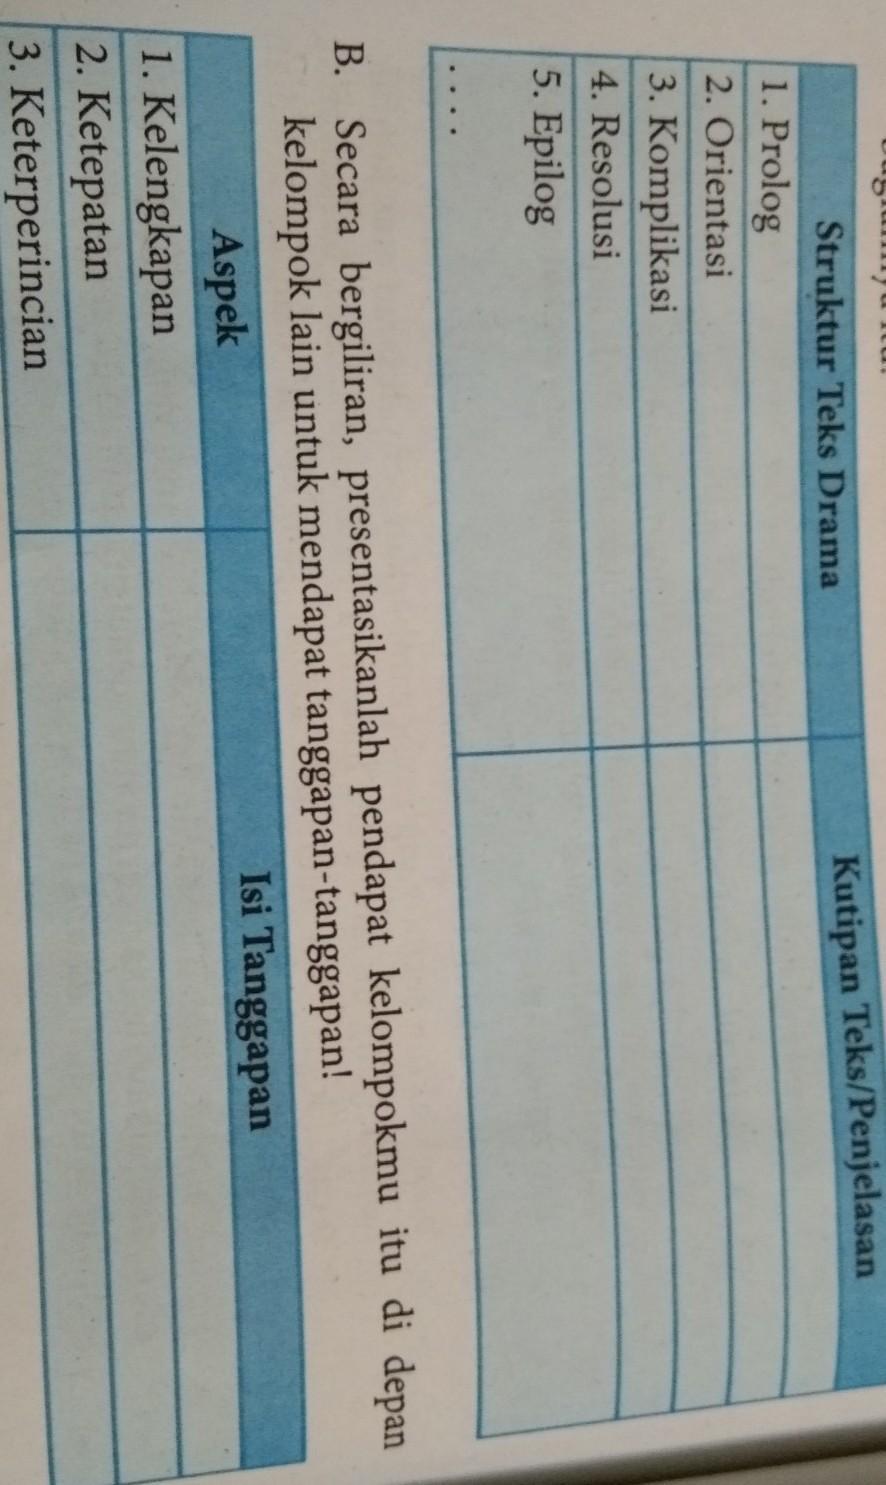 Kegiatan 8.5 Bahasa Indonesia Kelas 8 Semester 2 : kegiatan, bahasa, indonesia, kelas, semester, TOLONG, BESOK, DIKUMPUL, KEGIATAN, Brainly.co.id